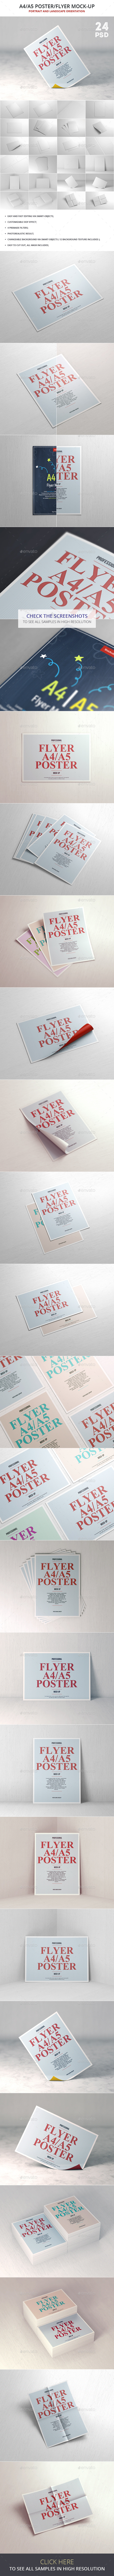 A4 / A5 Poster Flyer Mockup vol.3 - Flyers Print